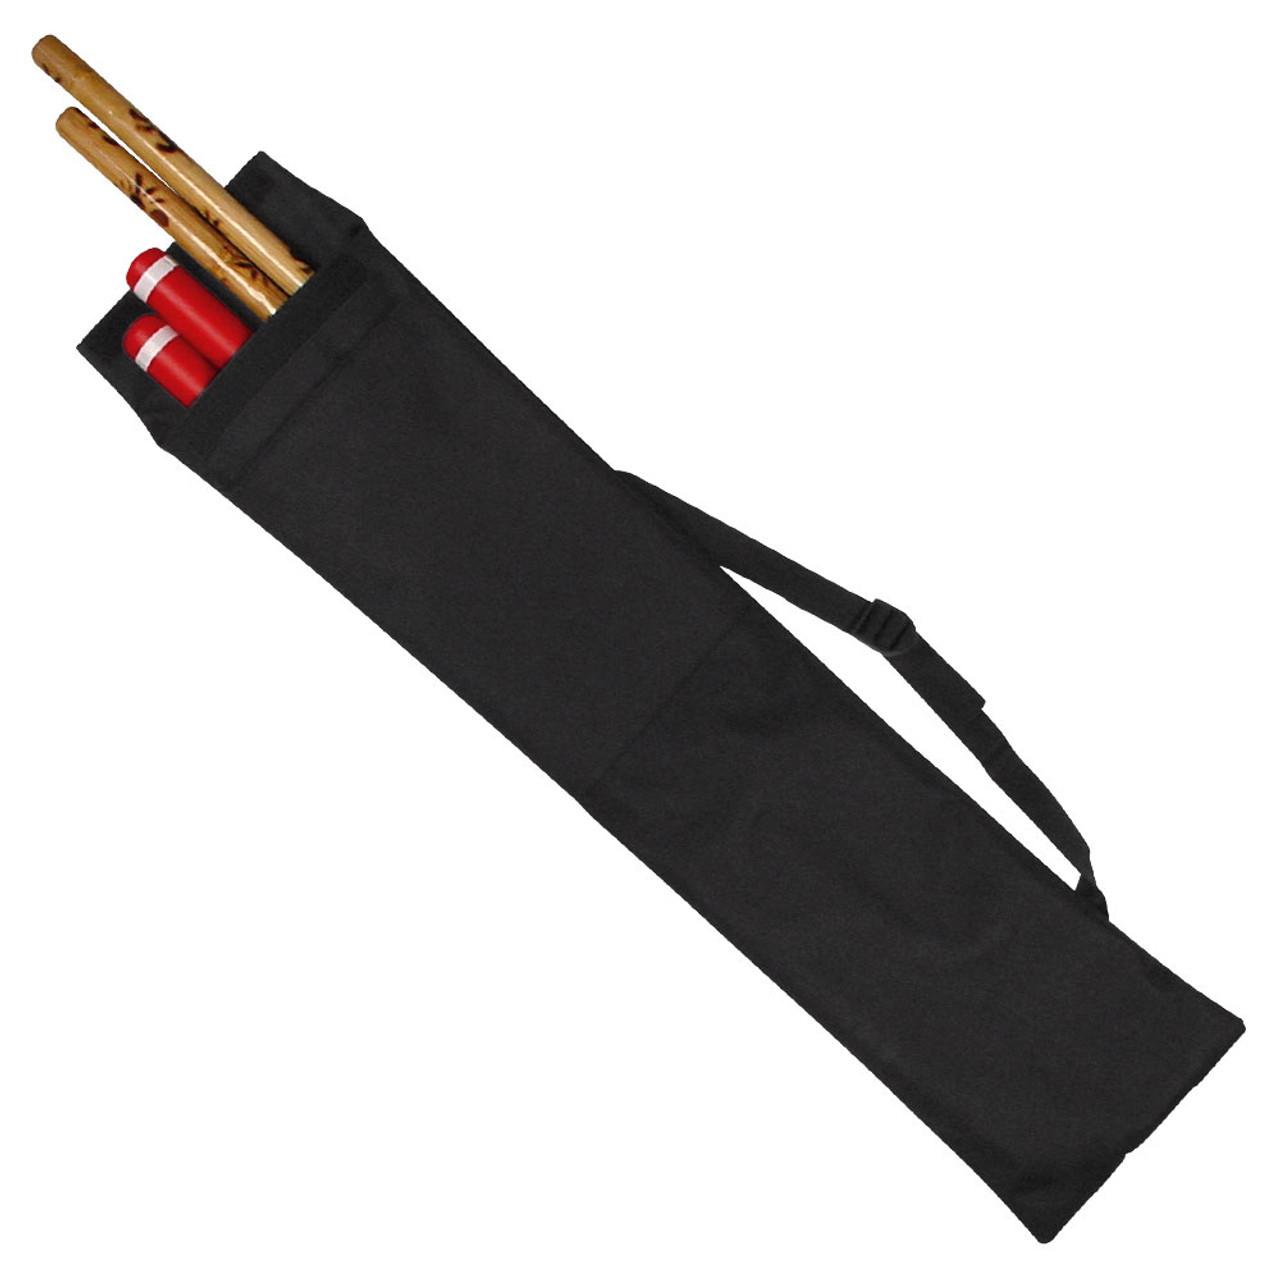 Deluxe Kali/Escrima Carry Case